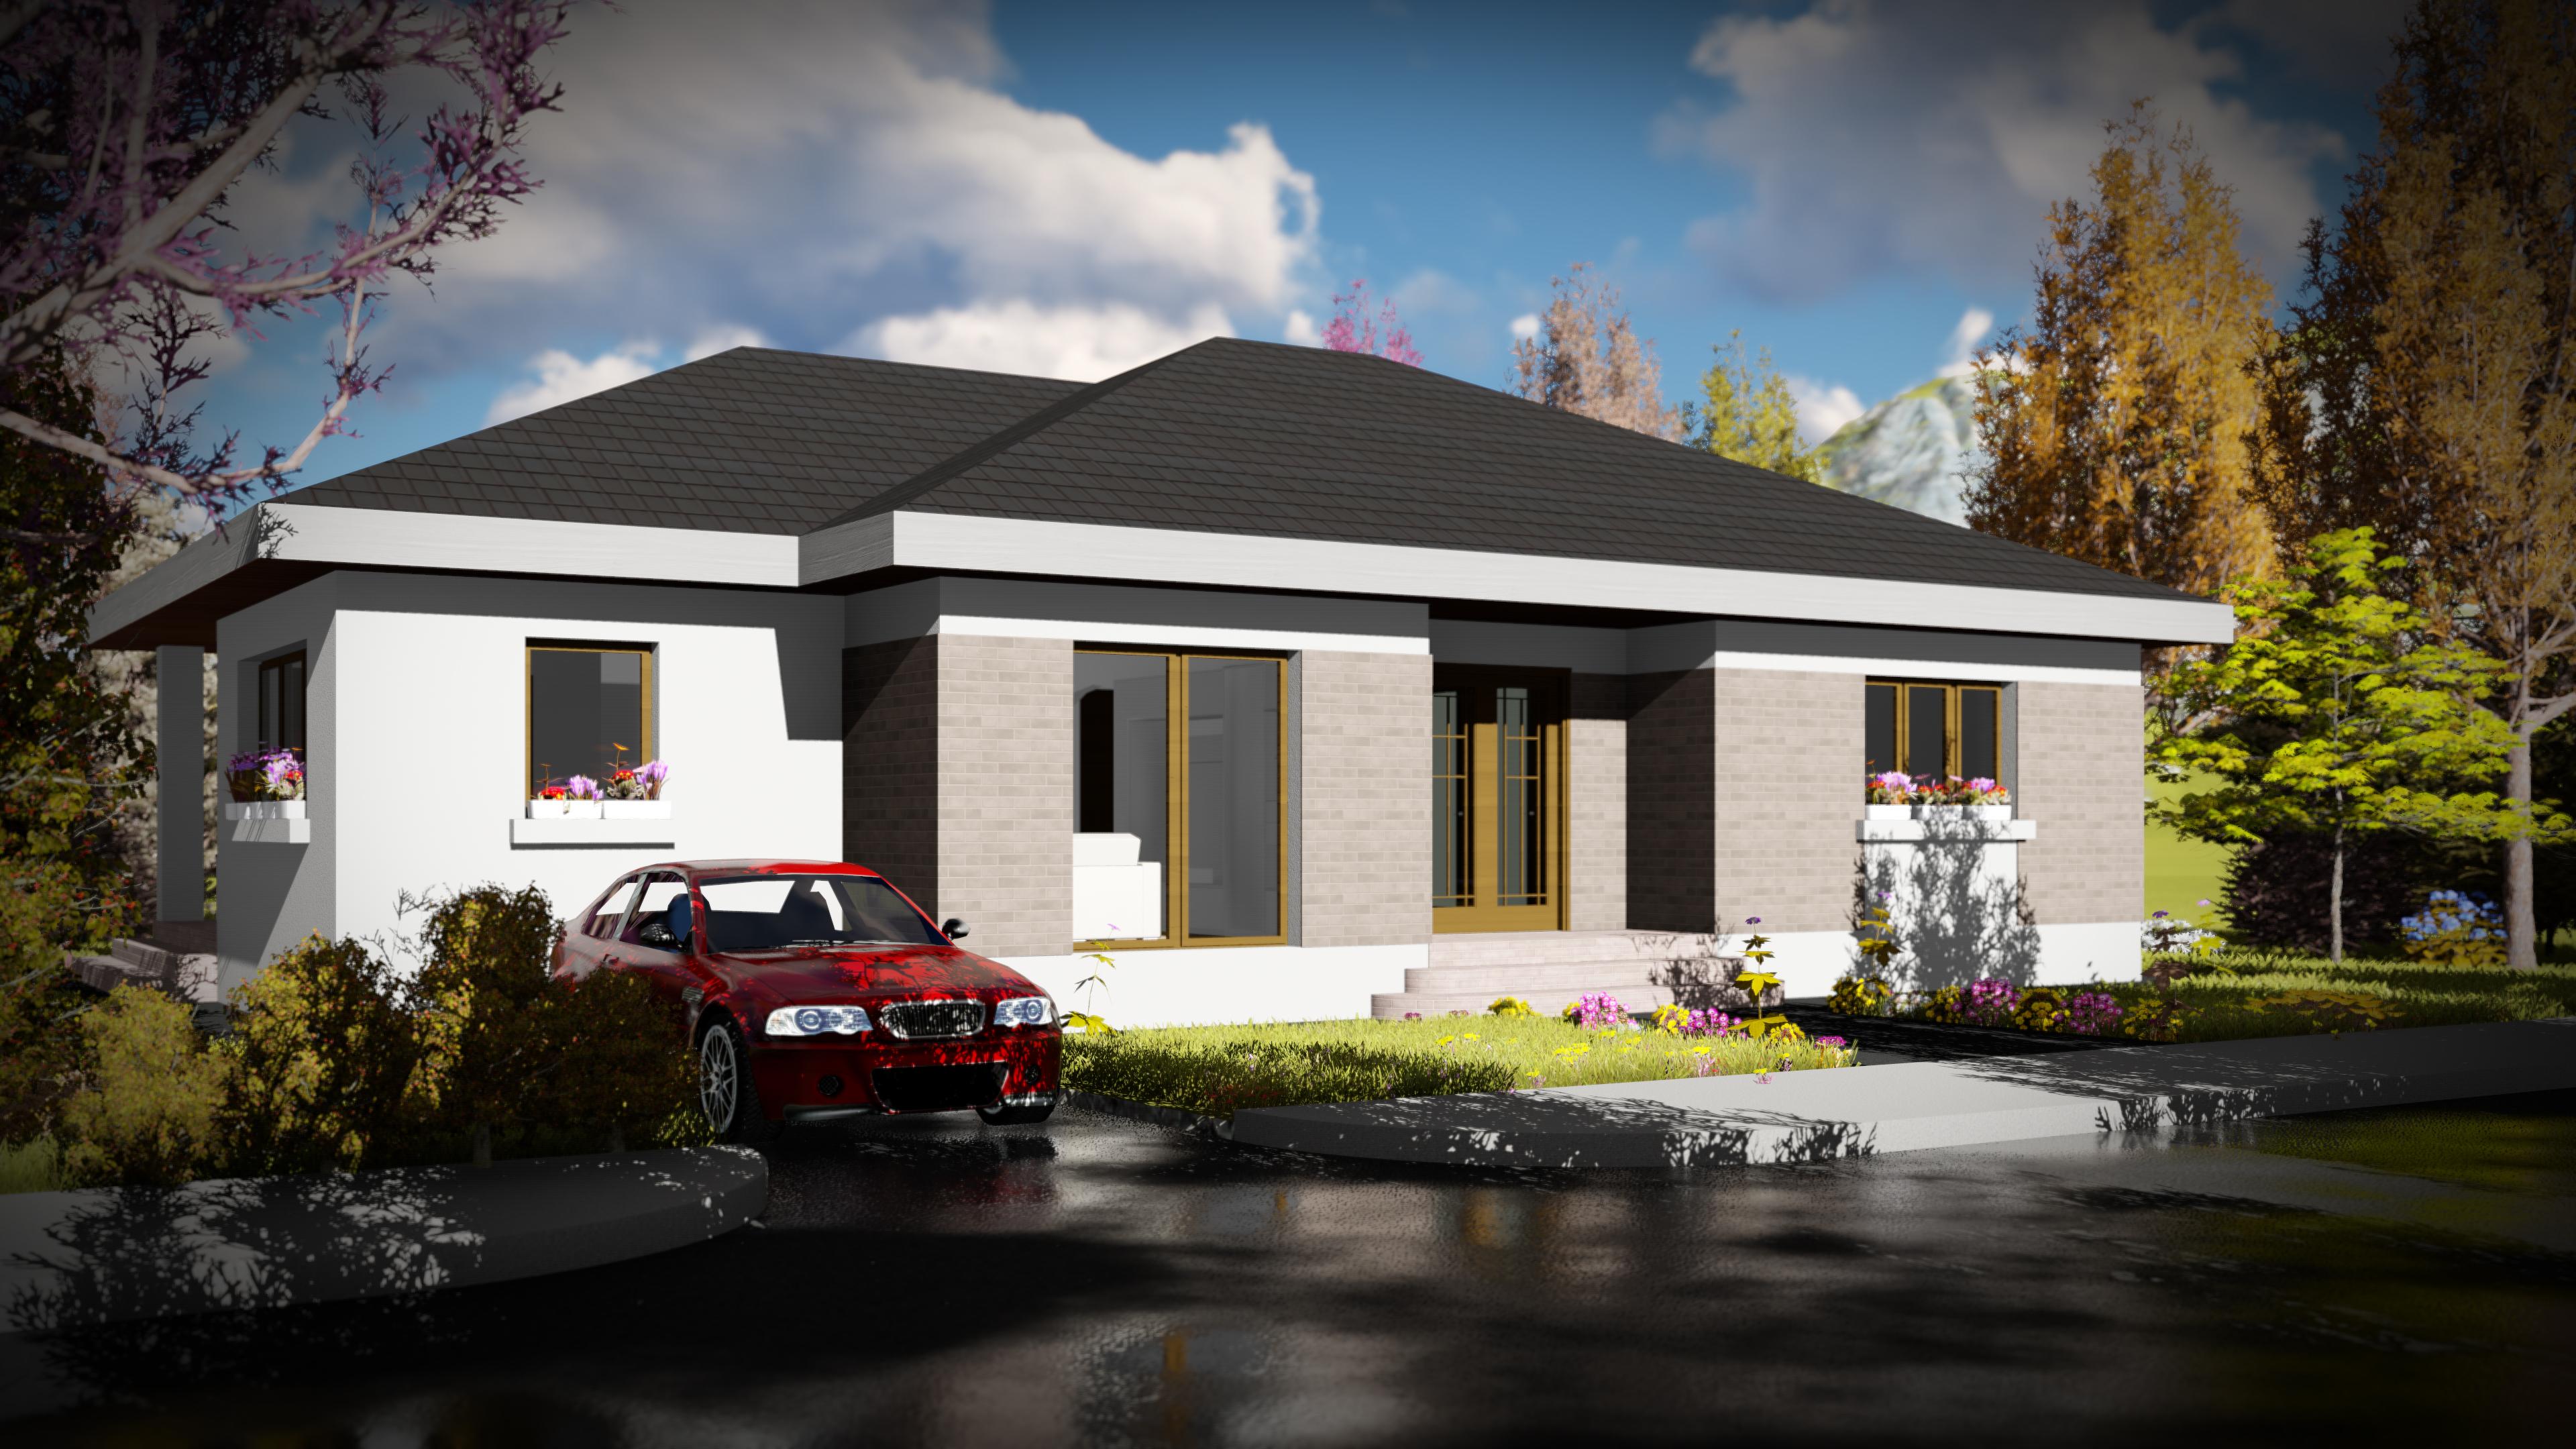 Case moderne finest proiect casa case with case moderne for Case bellissime minecraft